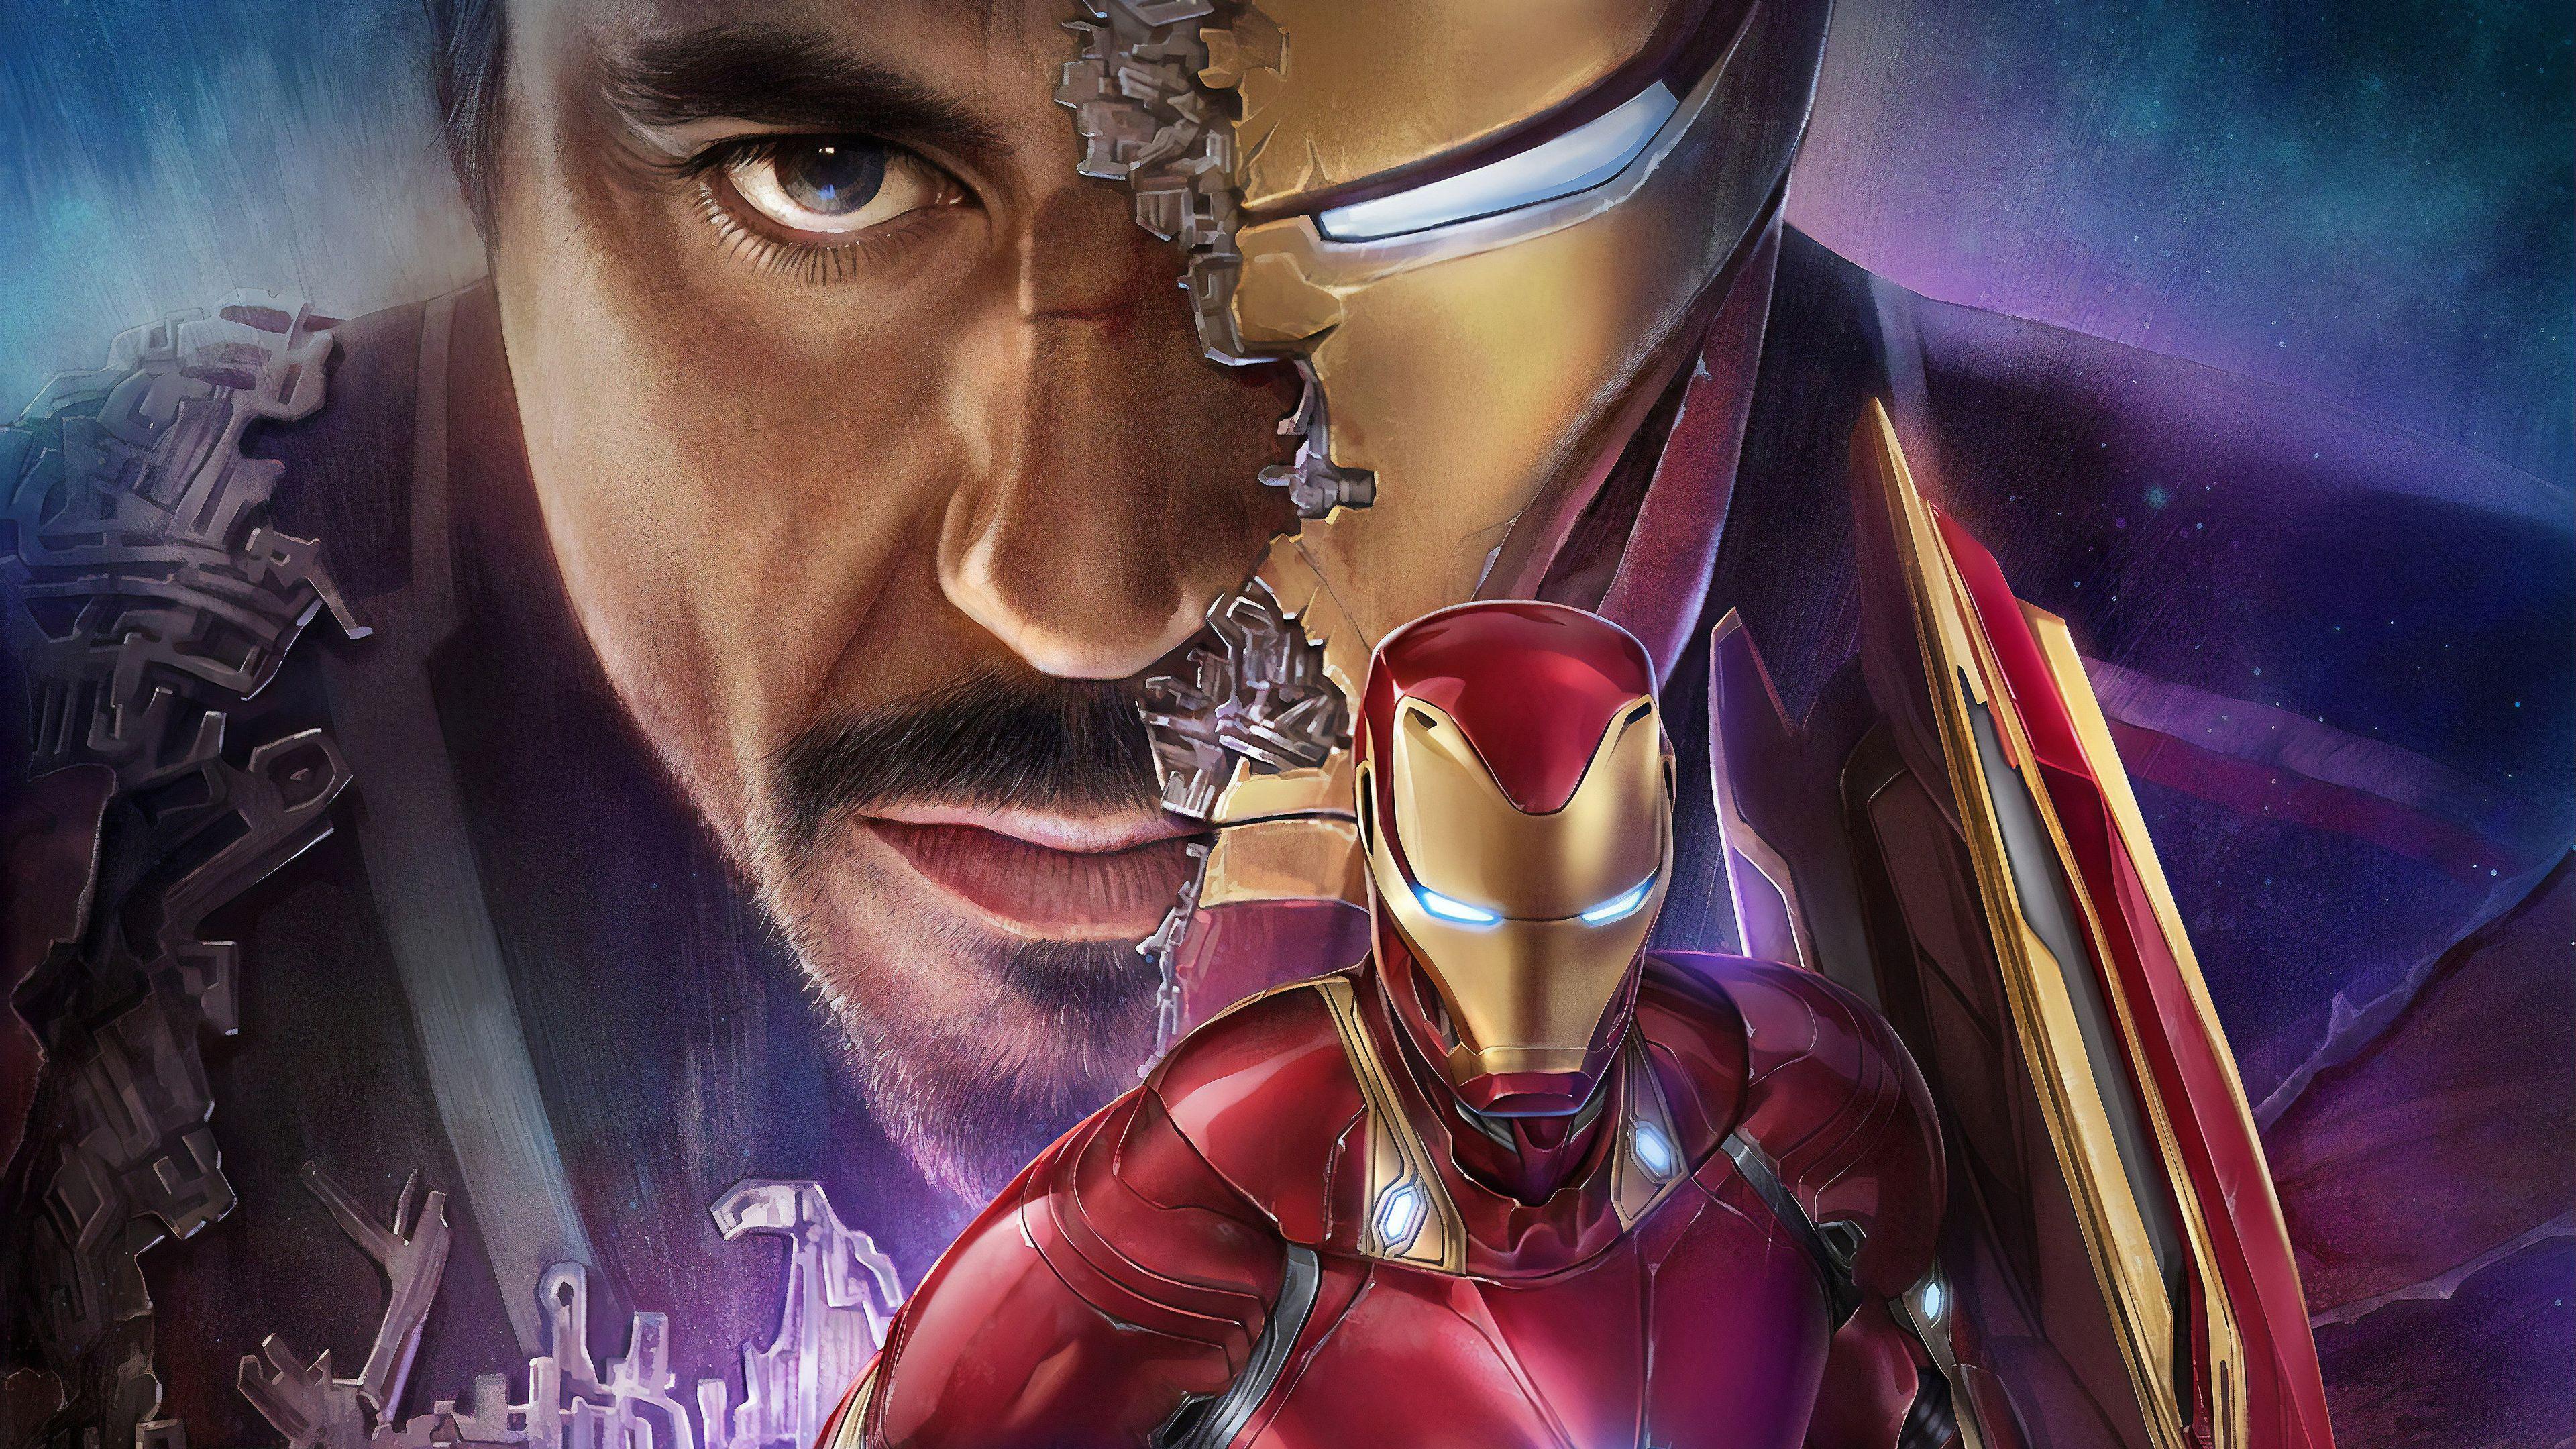 Tony Stark Iron Man 4k Superheroes Wallpapers Iron Man Wallpapers Hd Wallpapers Deviantart Wallpapers Iron Man Wallpaper Iron Man Hd Images Iron Man Artwork